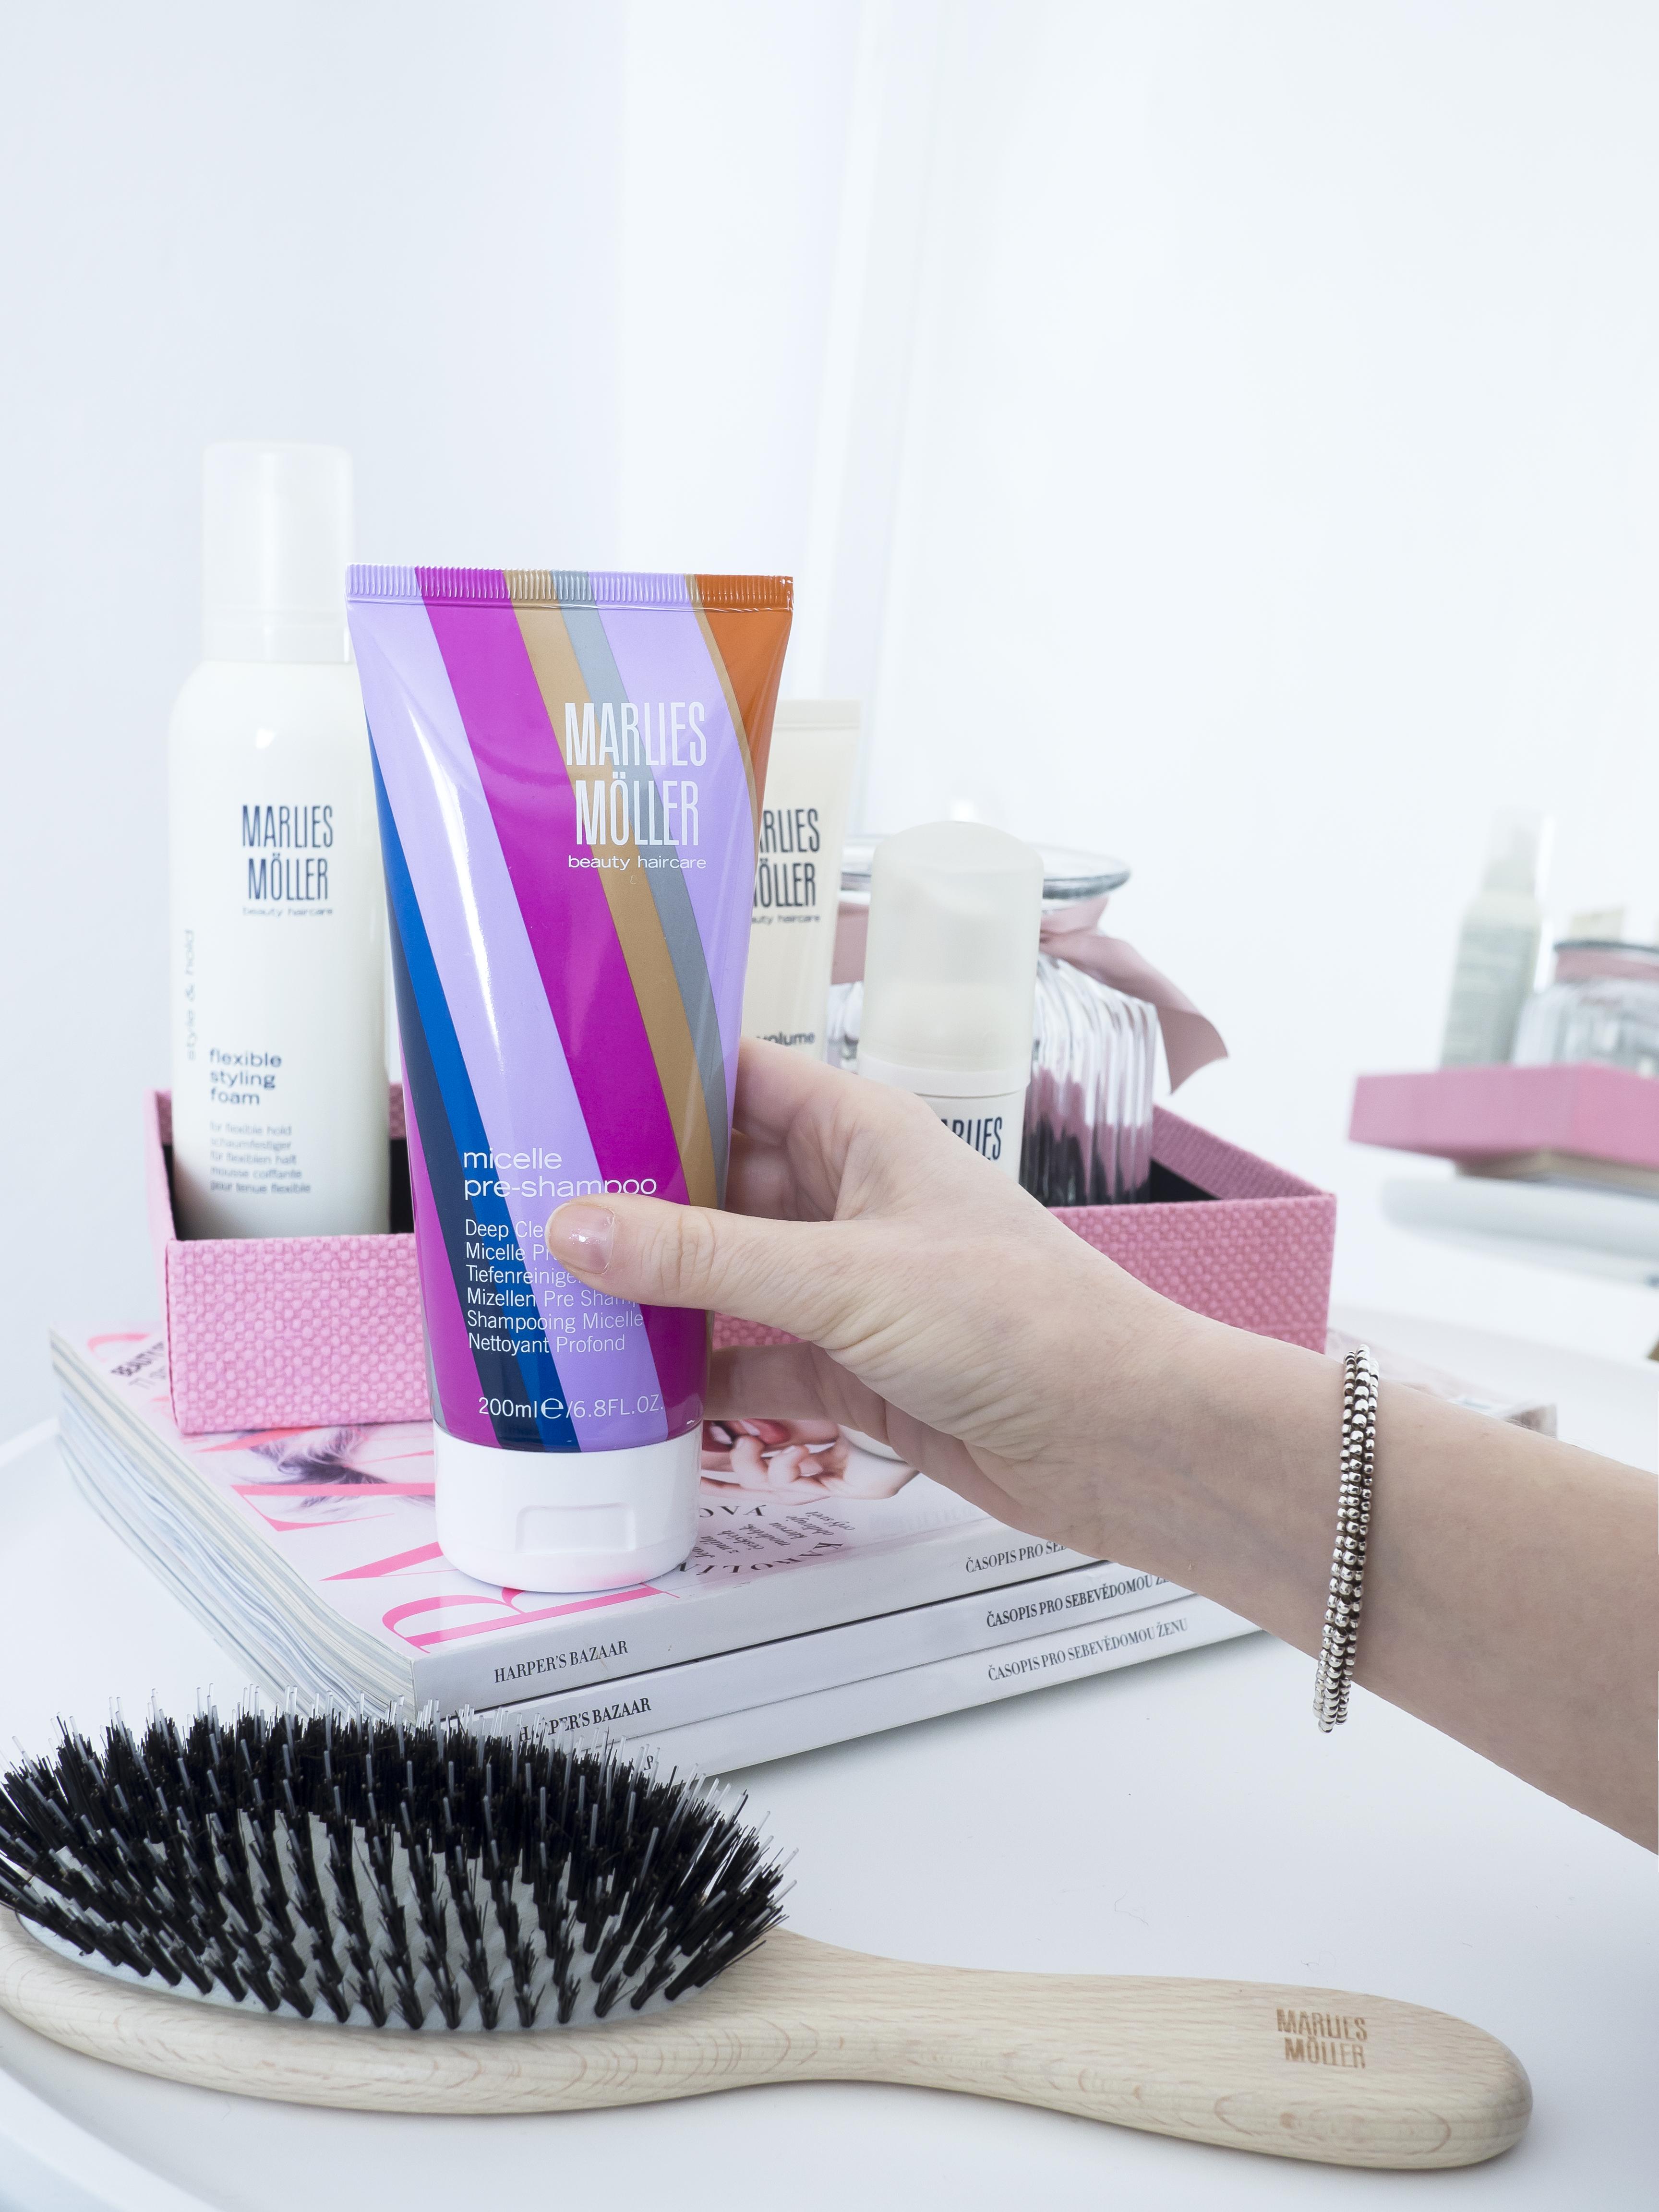 Marlies Möller micelle pre-shampoo šampón